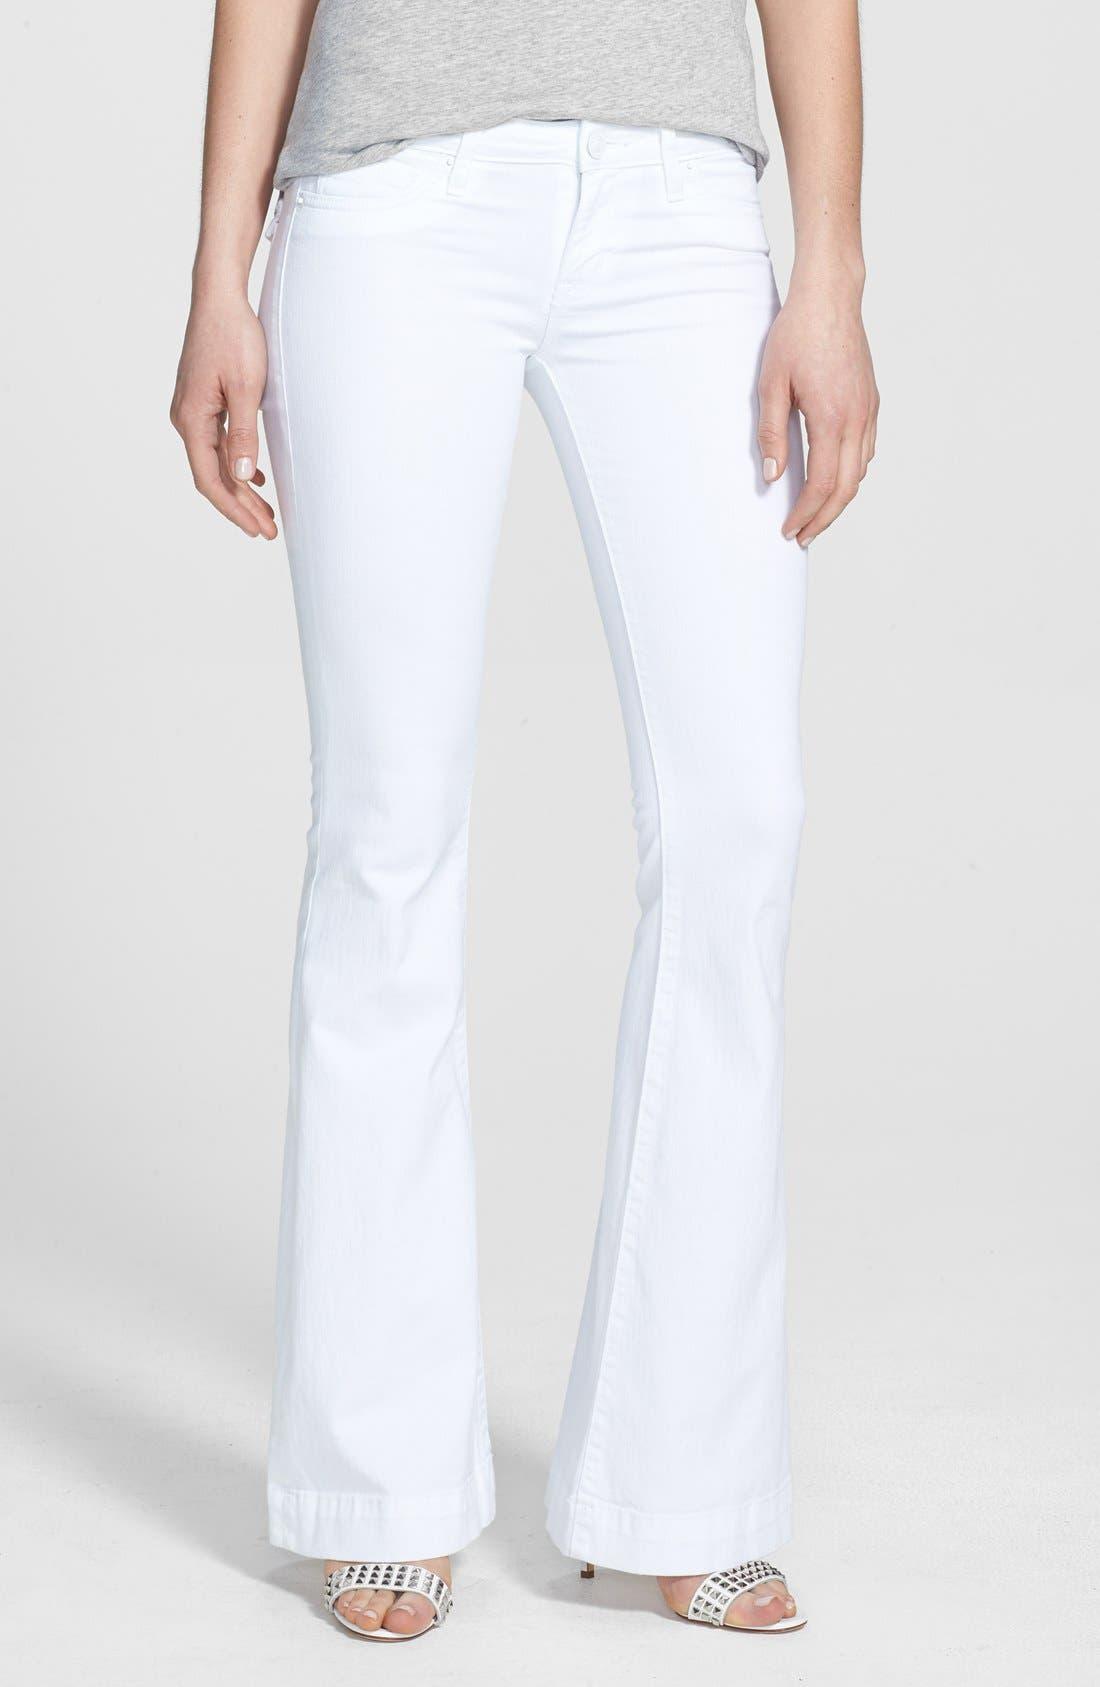 Alternate Image 1 Selected - Hudson Jeans 'Ferris' Flared Jeans (White)